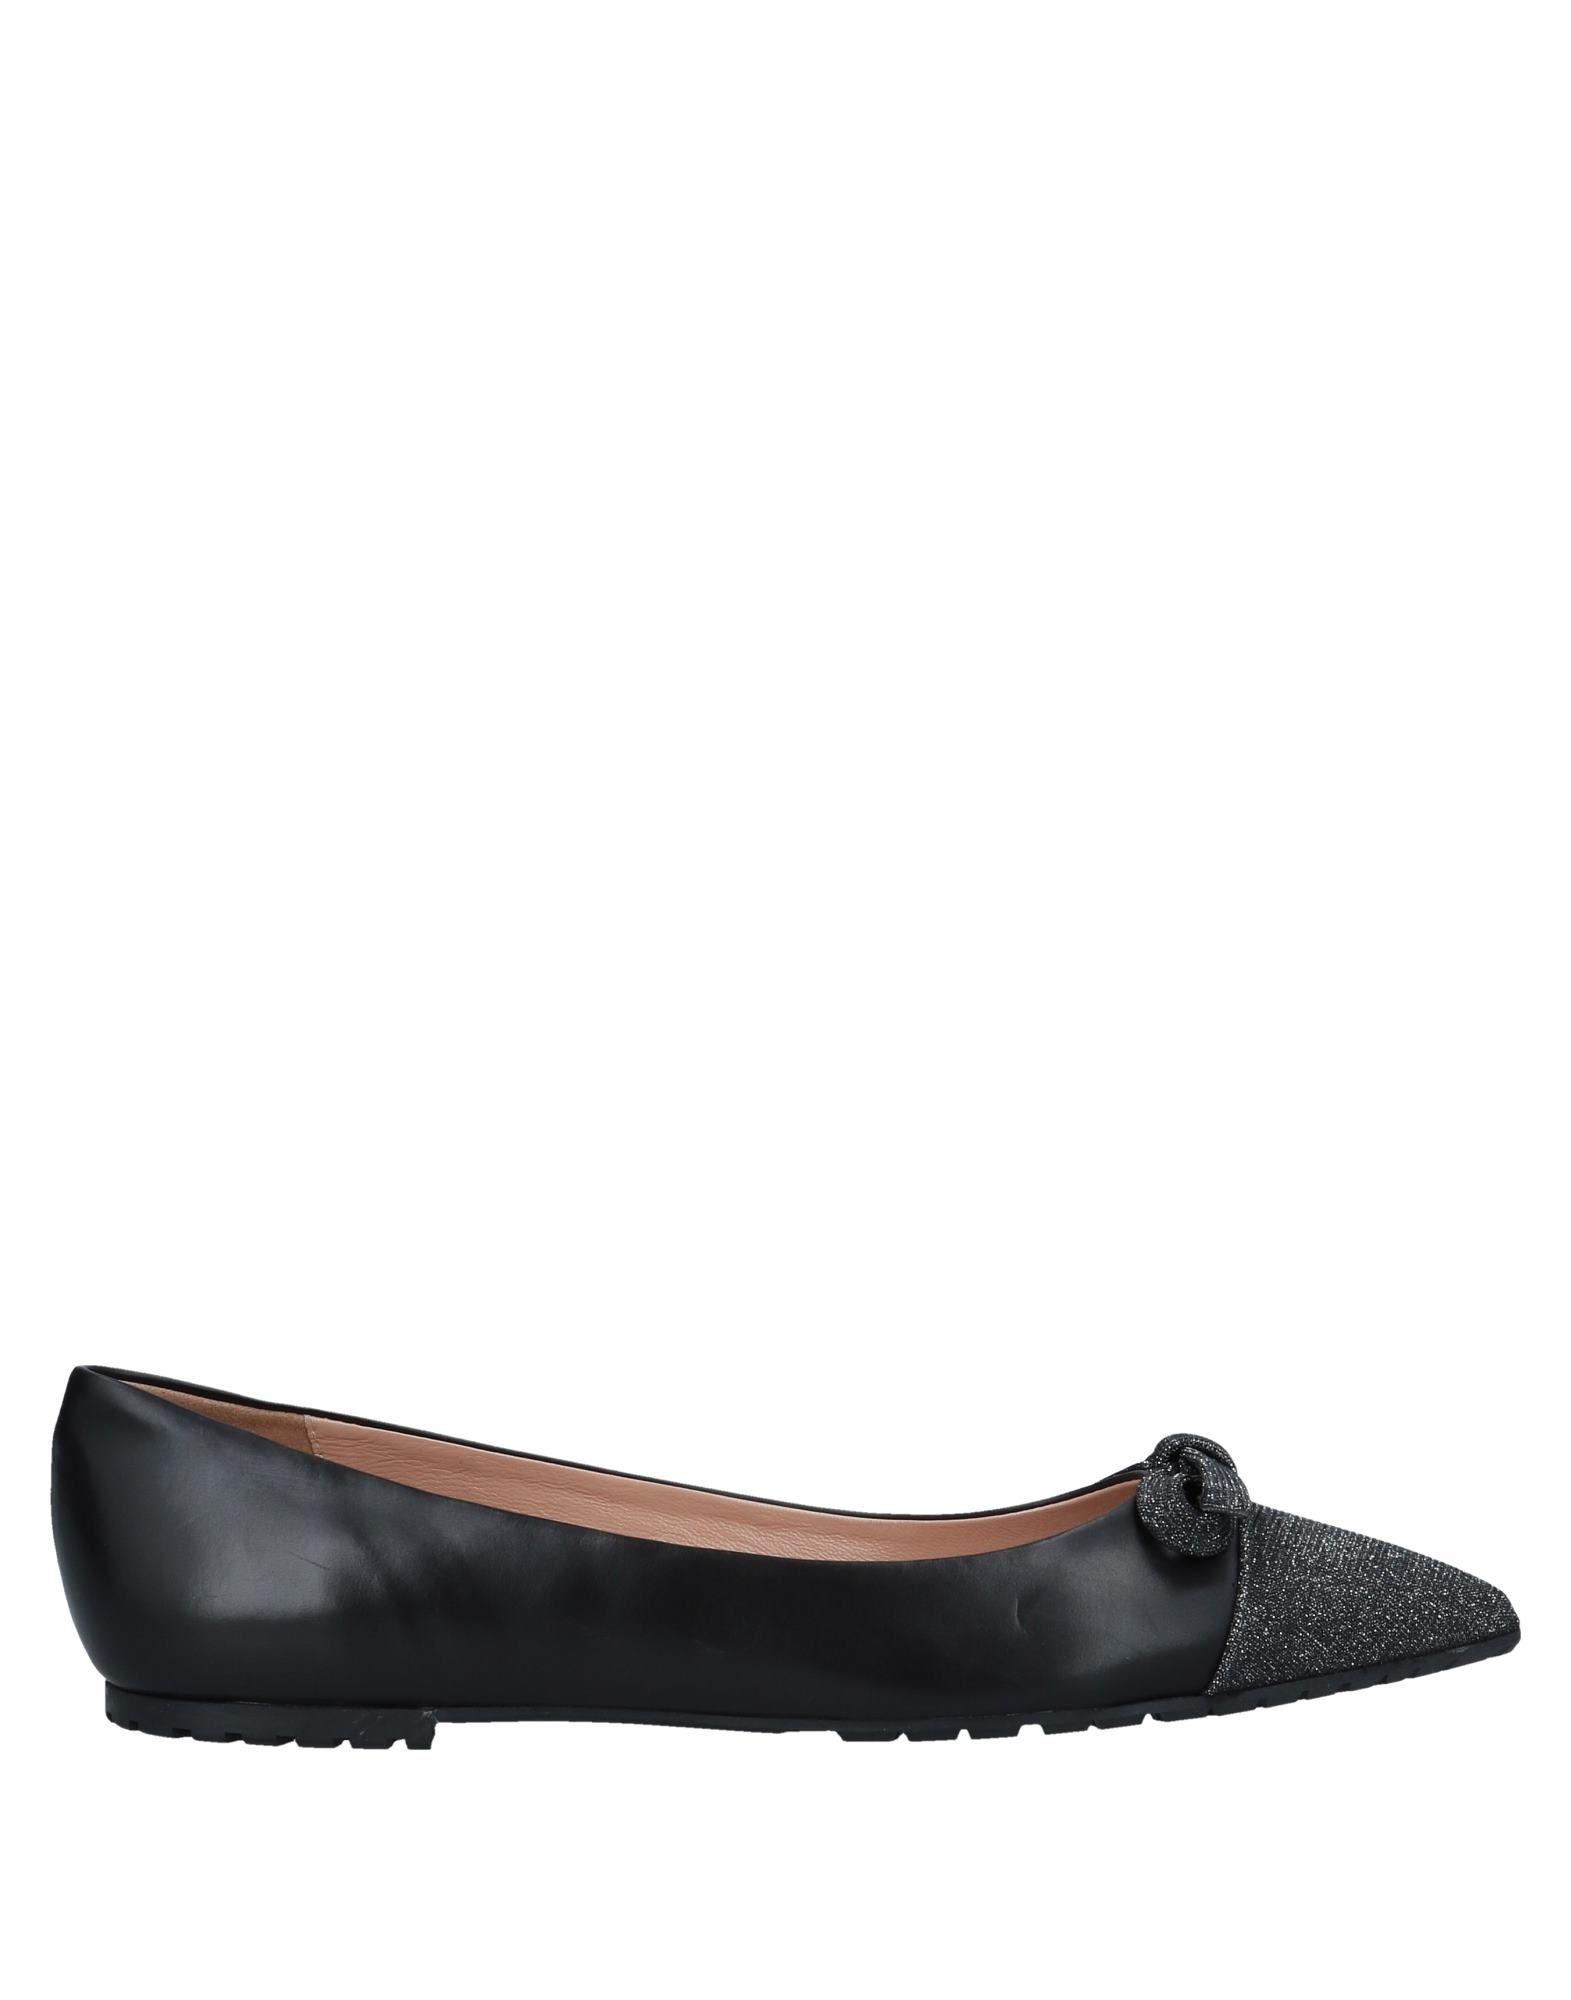 Fleury Ballerinas Damen  11556508PB Gute Qualität beliebte Schuhe Schuhe Schuhe 50af8c